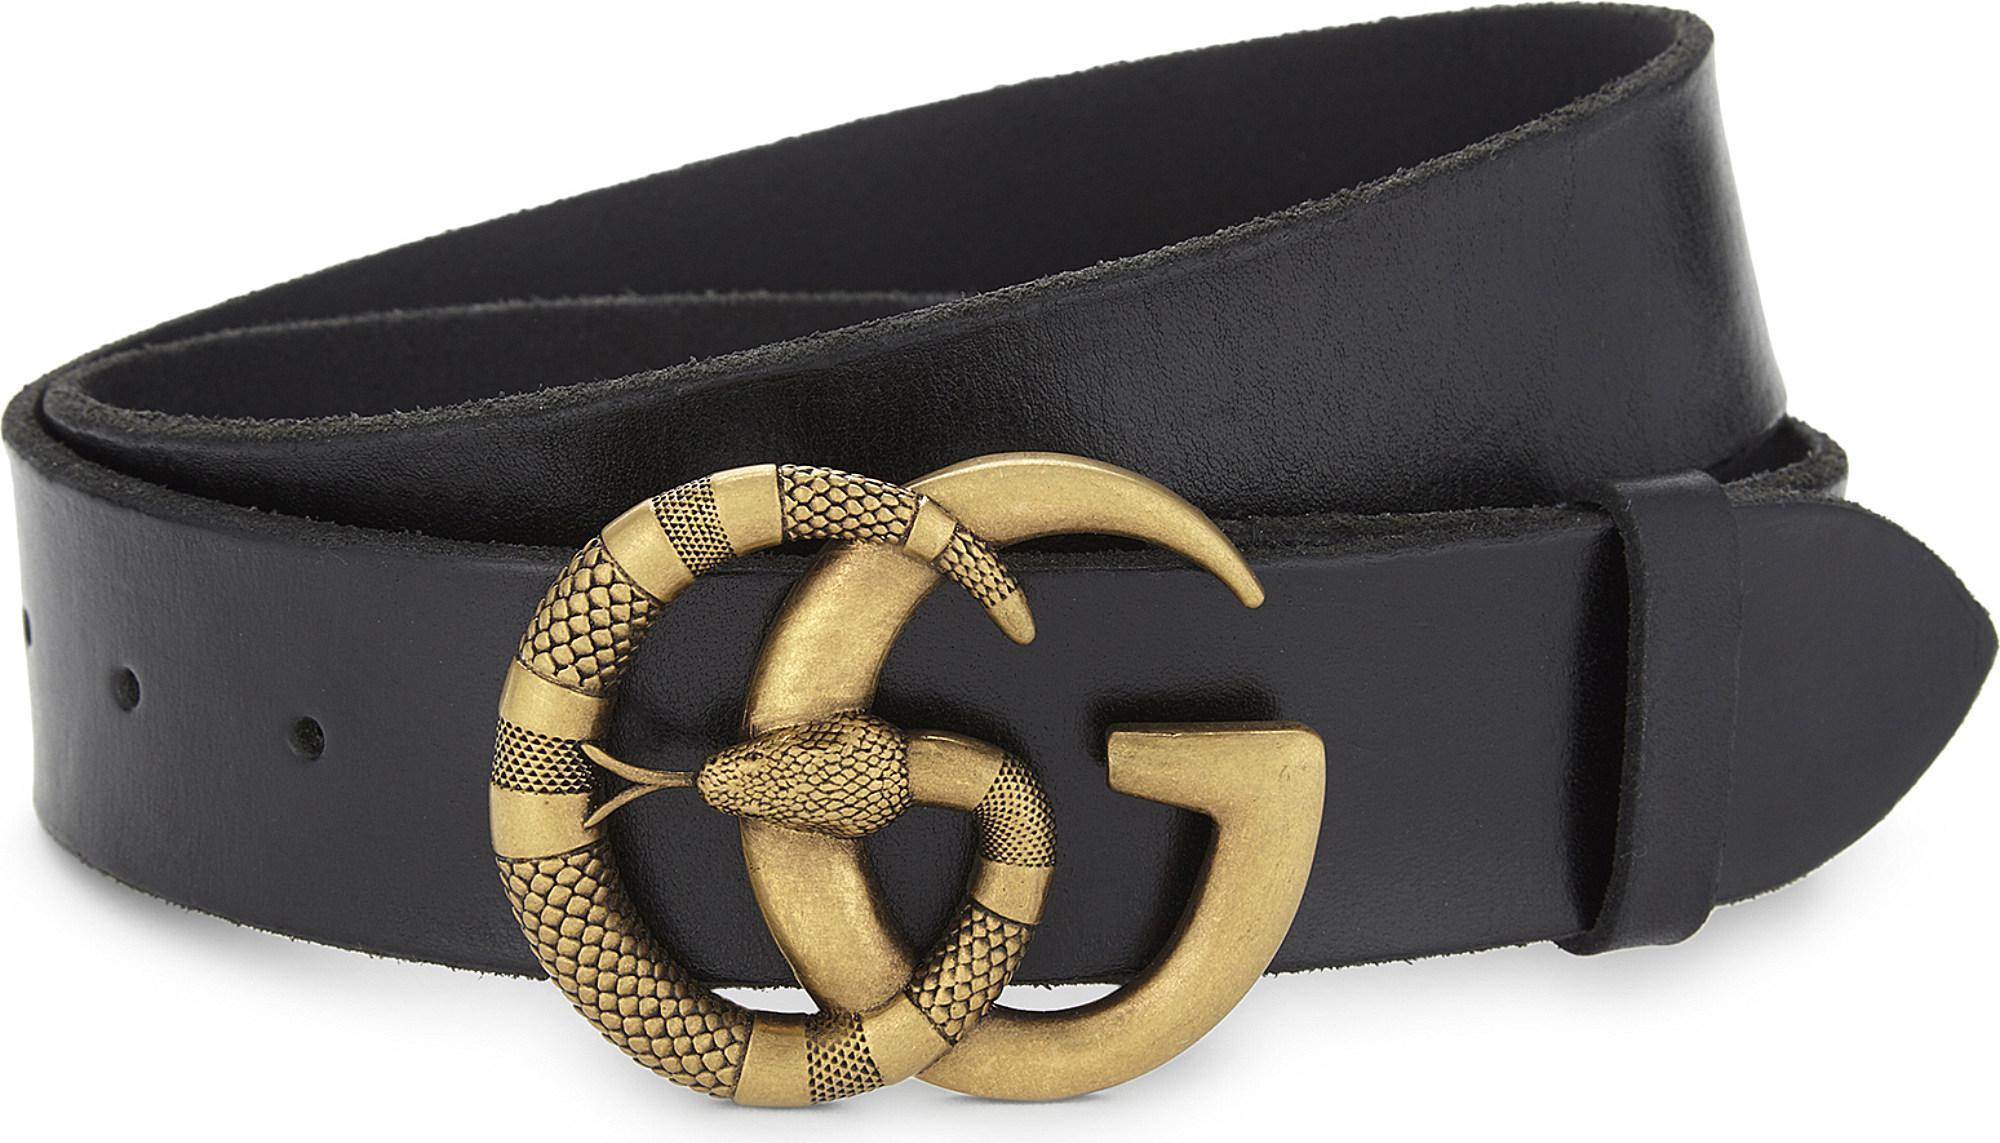 31c58d33f30 Lyst - Gucci Snake Gg Buckle Leather Belt in Black for Men